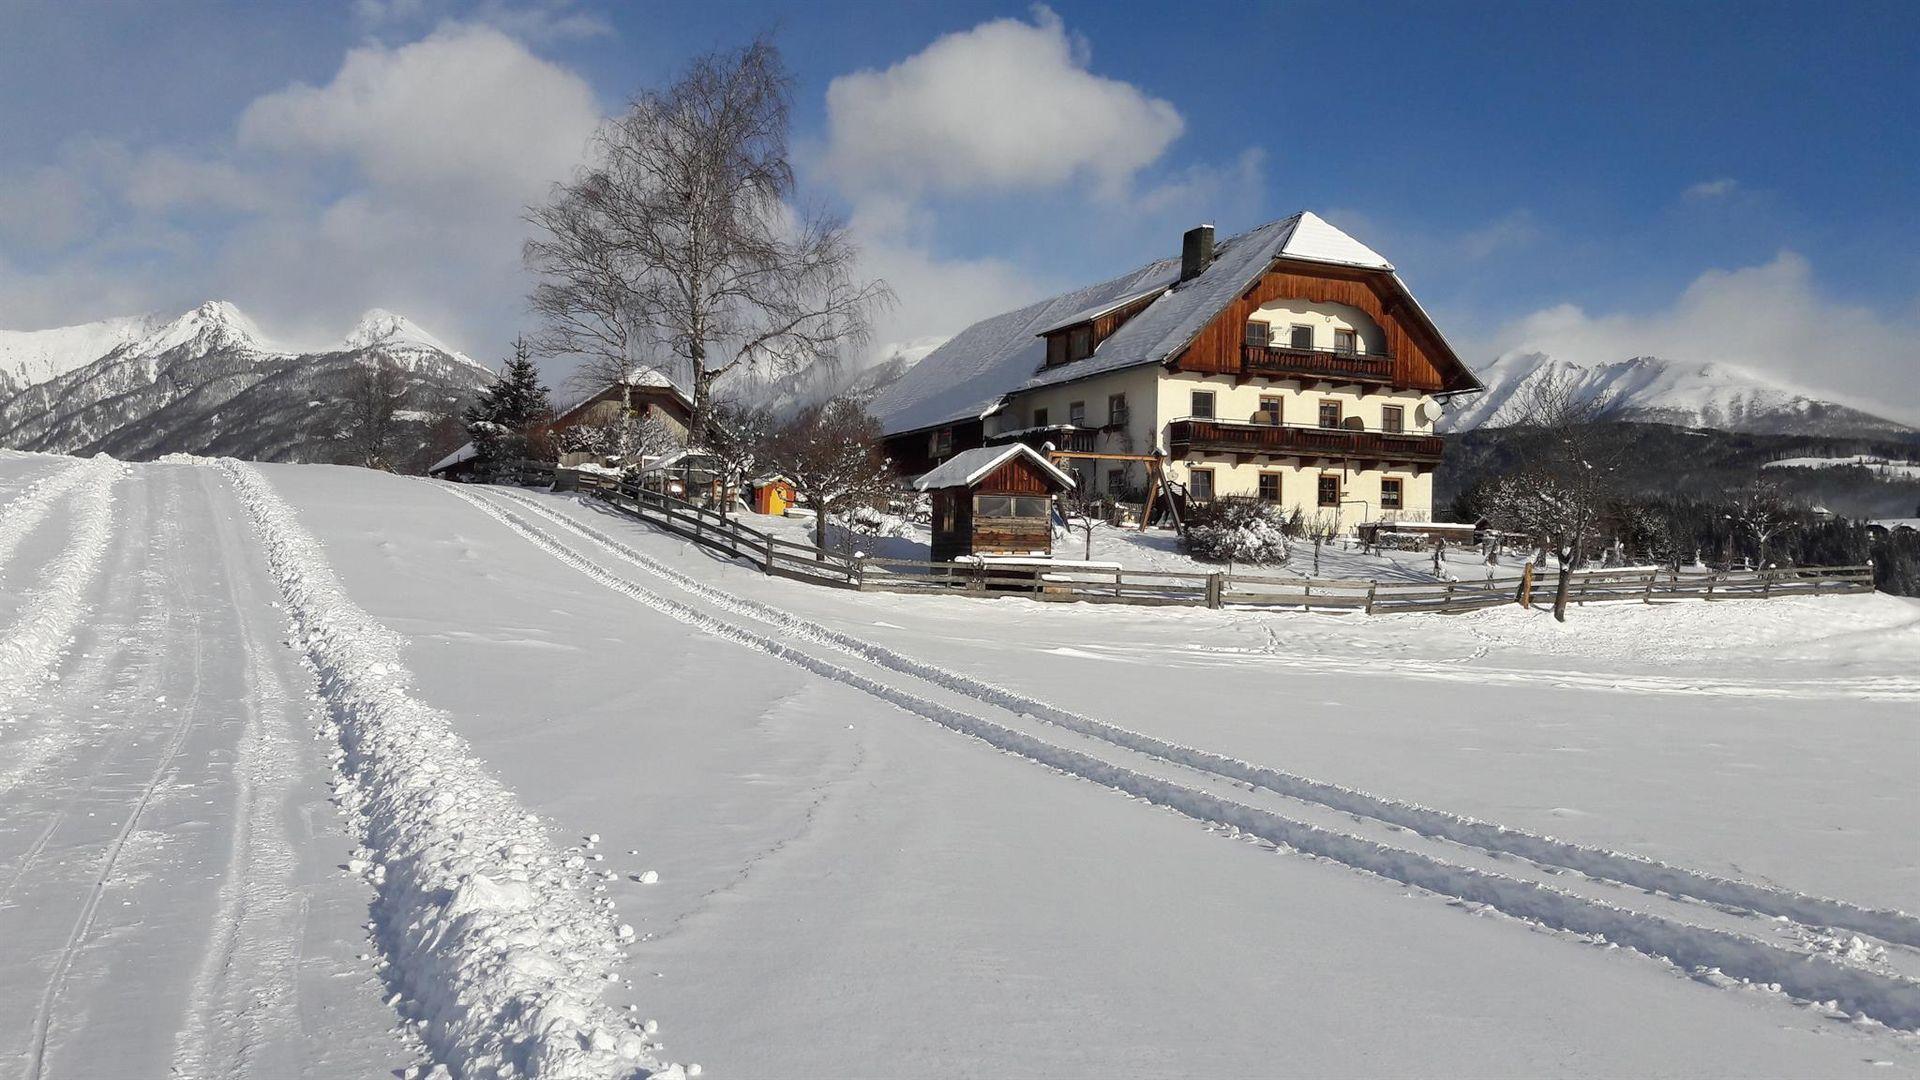 Appartement de vacances 2-Pers.-Studio (ca. 14 m², Bergeblick), OV, Restlhof (2327413), Mariapfarr, Lungau, Salzbourg, Autriche, image 1